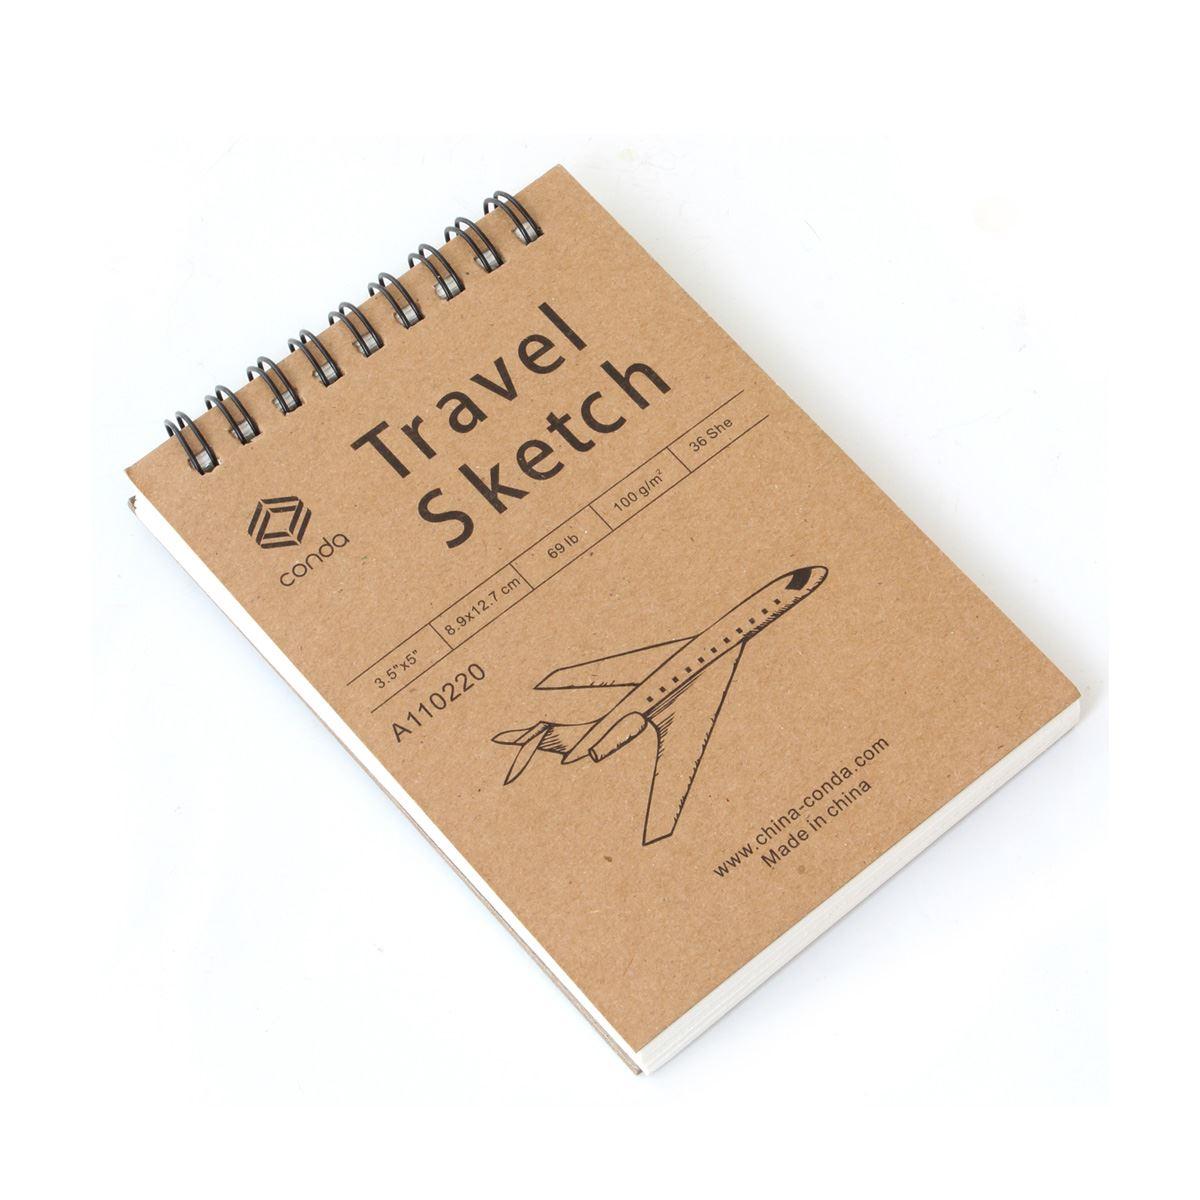 Travel spiral sketche pads 3.5x5 avion  - Sanborns